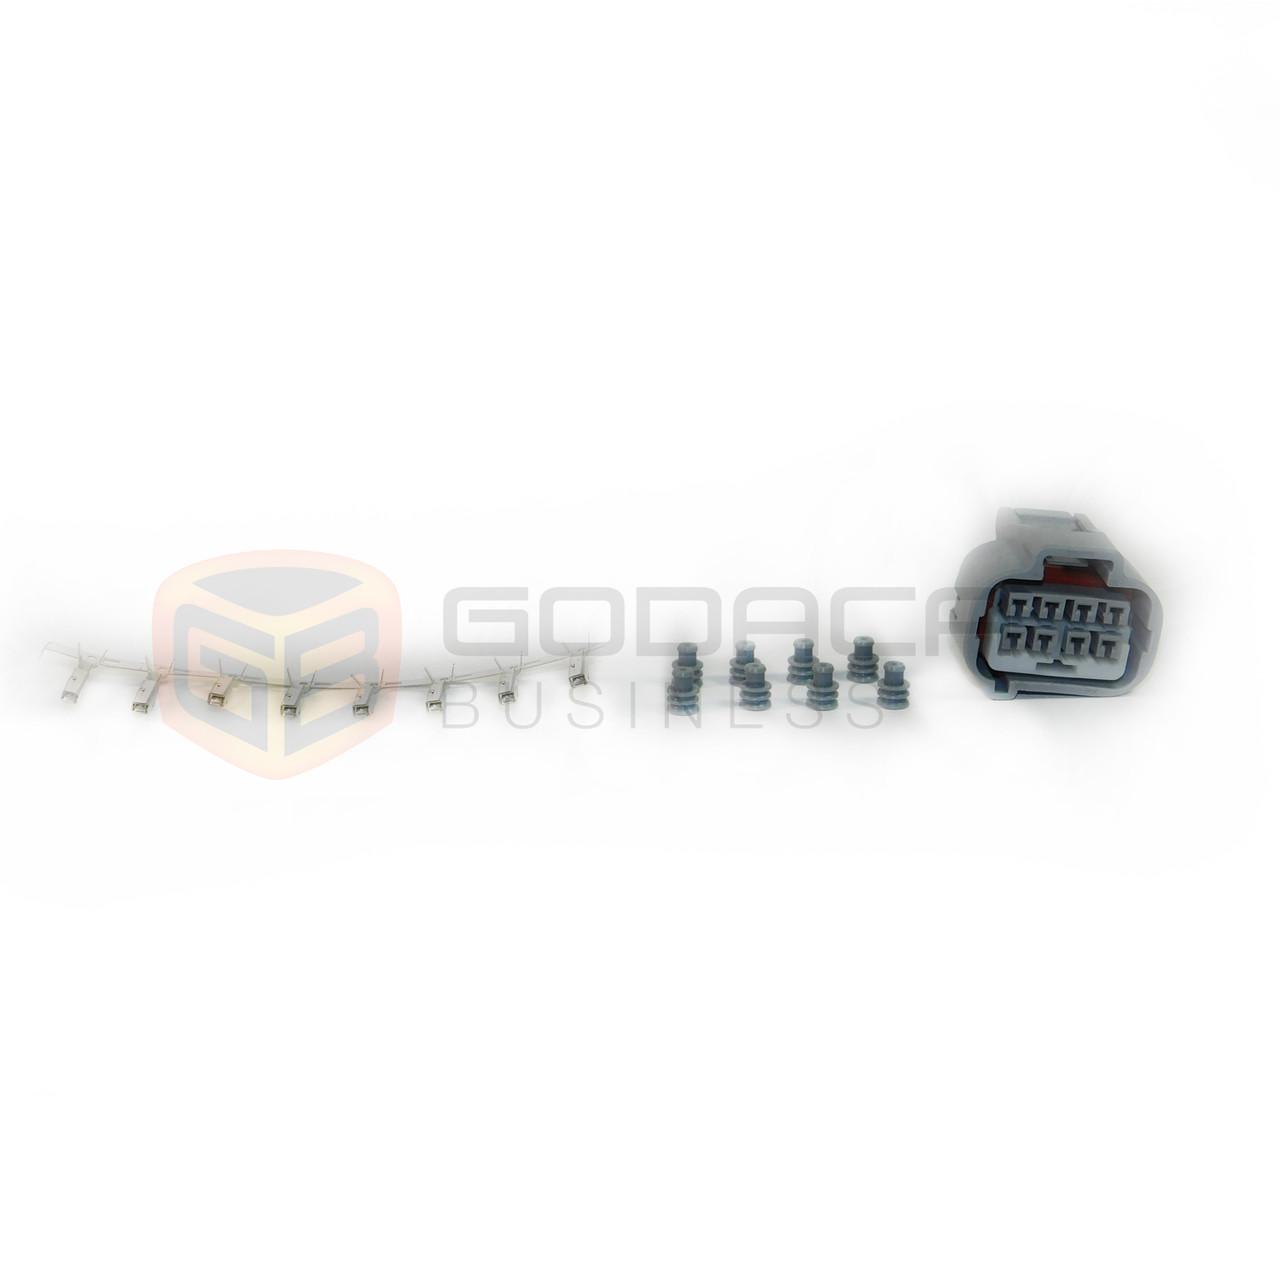 medium resolution of 1x connector for toyota supra mk4 fusebox 90980 10897 w out wire godaca llc